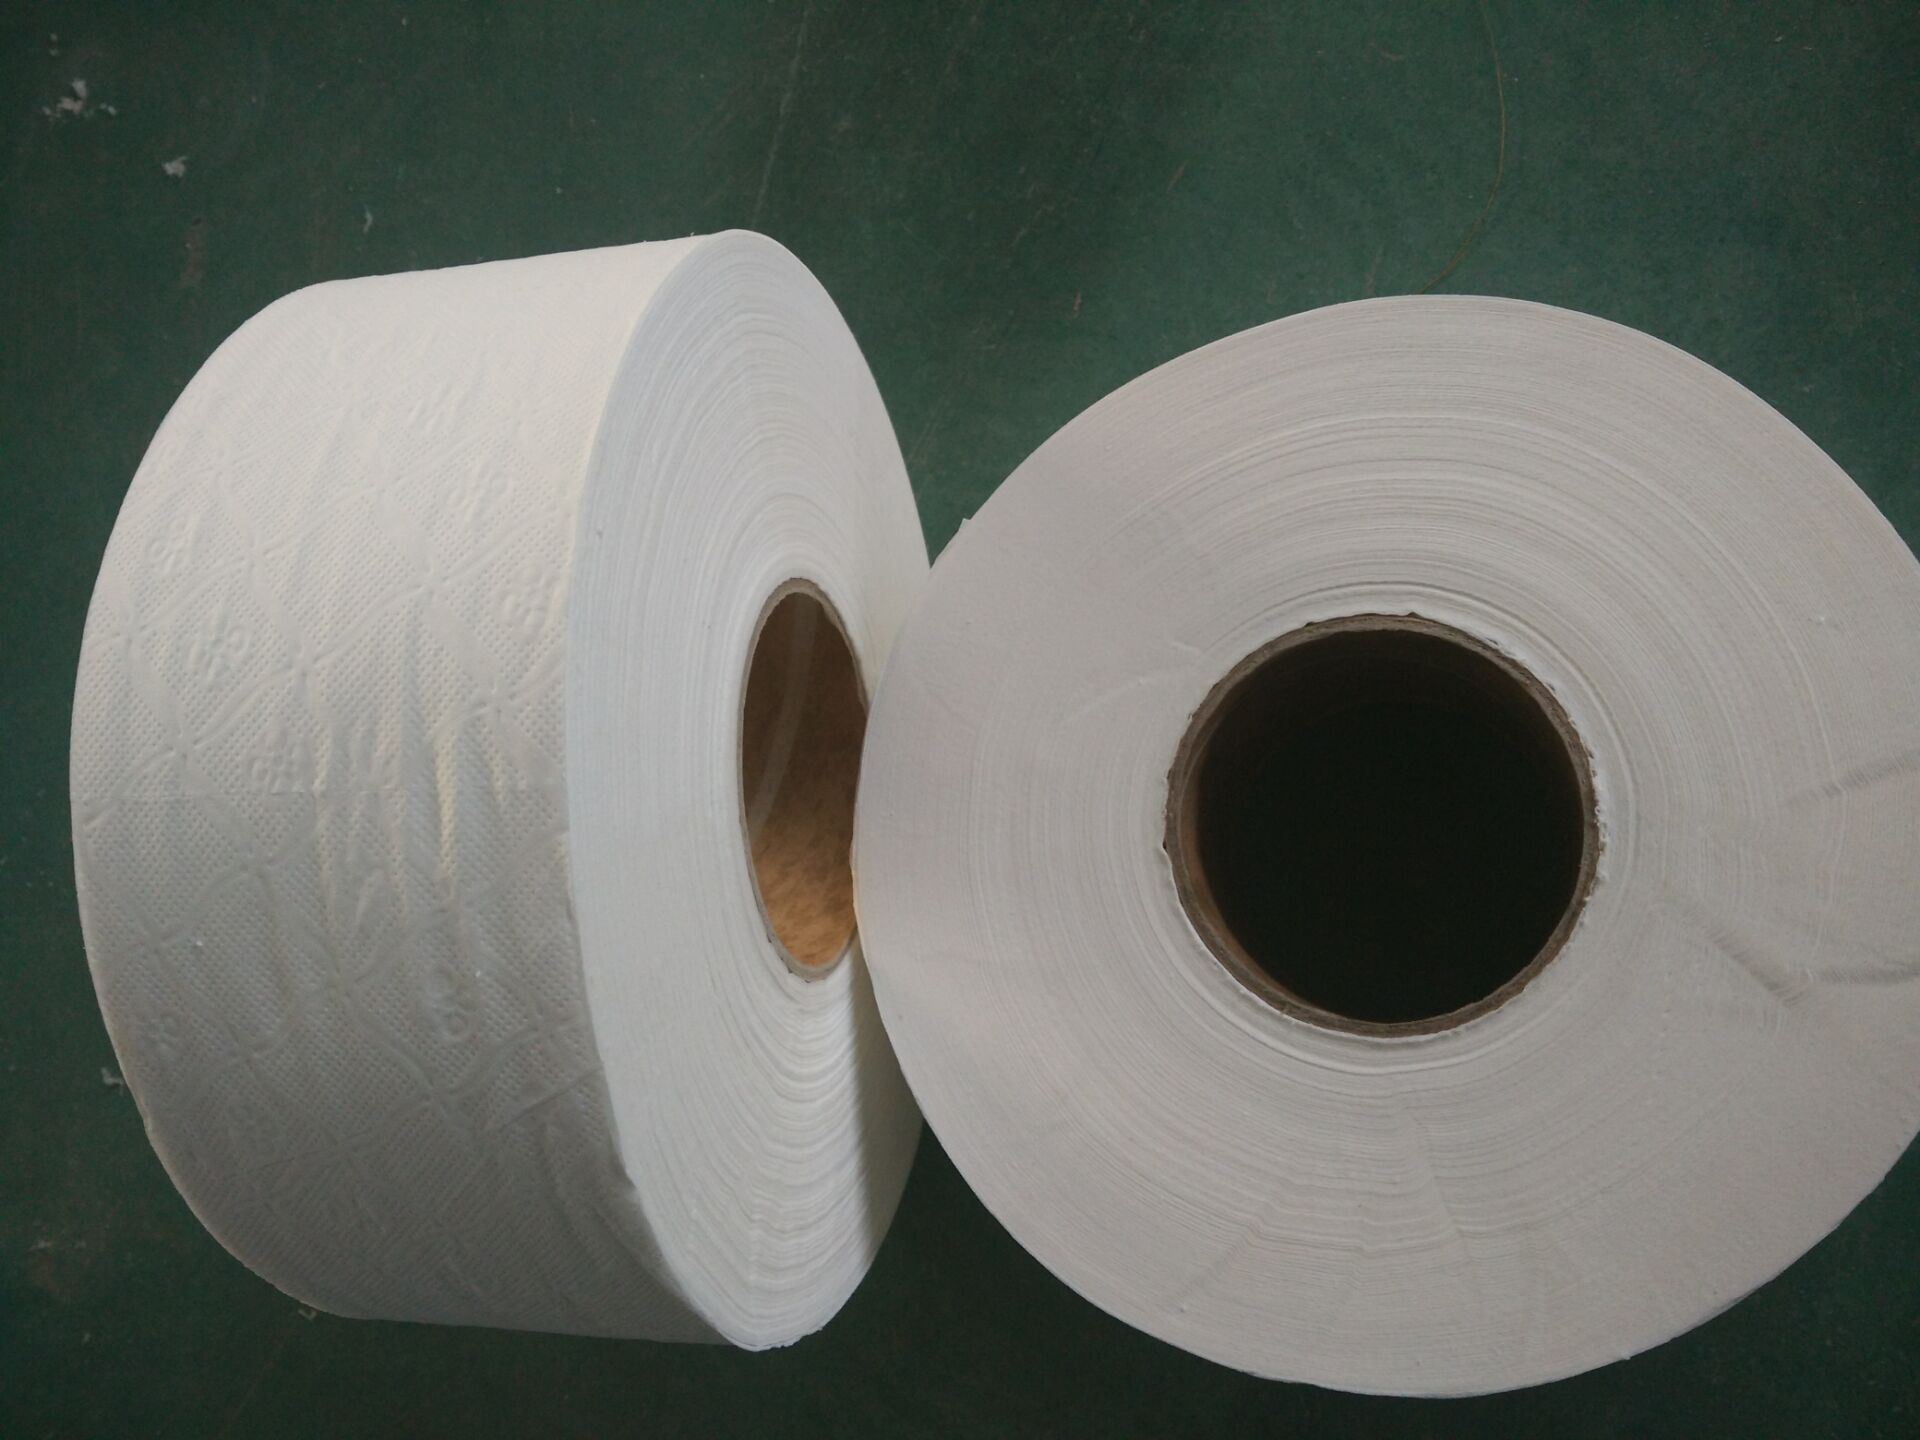 Virgin Pulp Jumbo Roll Tissue, Premium Quality Jrt, Embossing